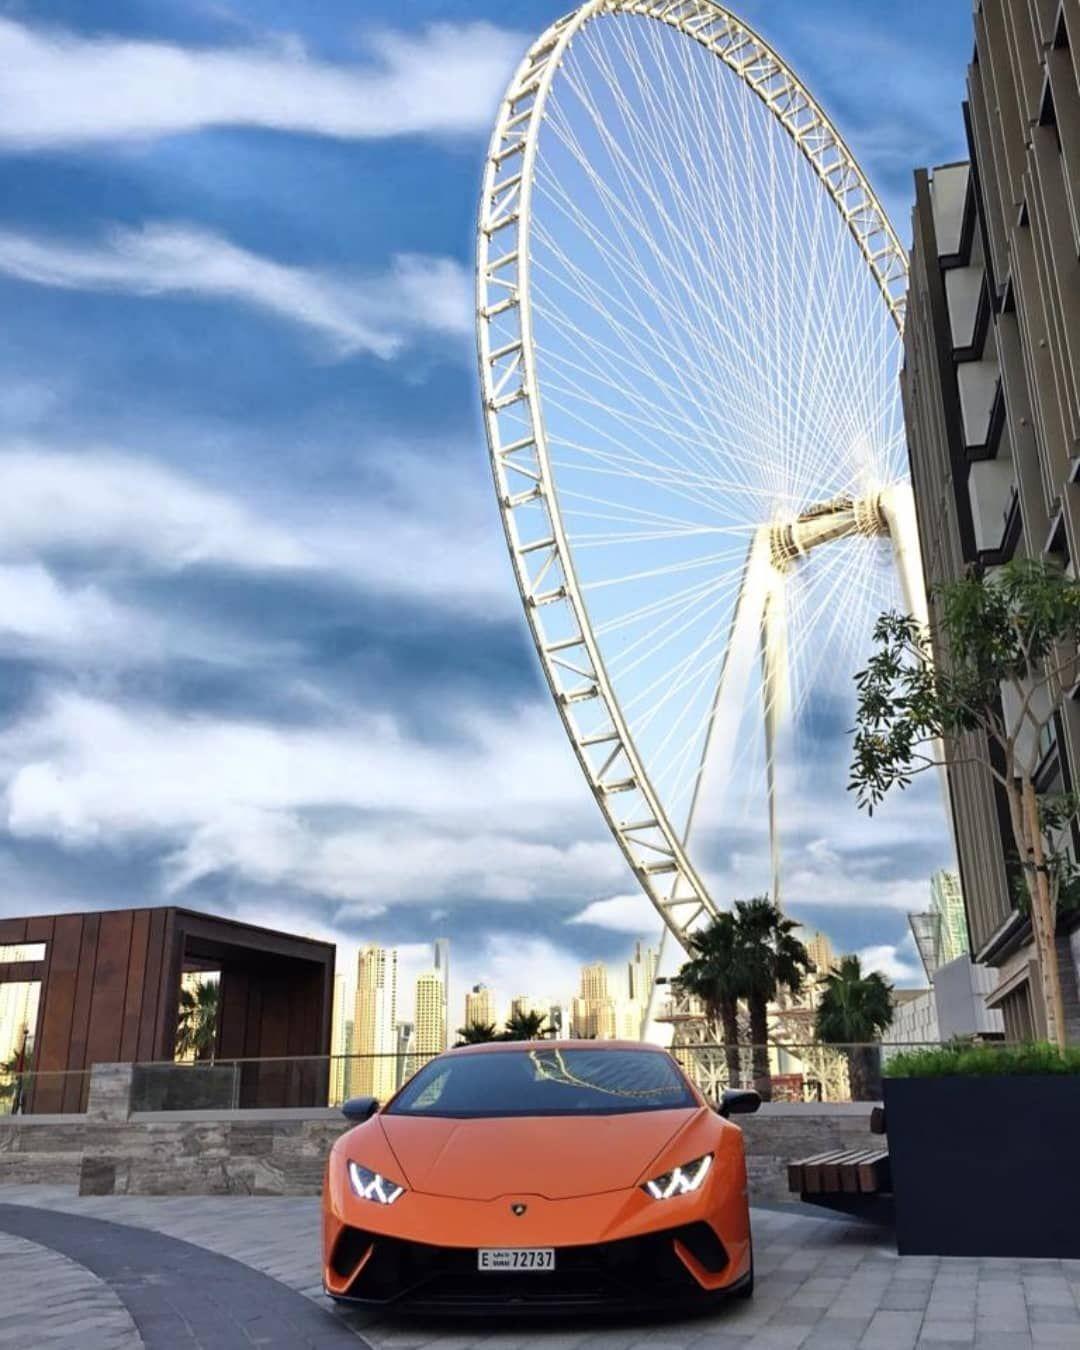 32 Likes 3 Comments Supercar Hire Dubai Hiresupercardubai On Instagram Lamborghinihuracanperformante Wan In 2020 Dubai Cars Sports Car Rental Luxury Car Hire